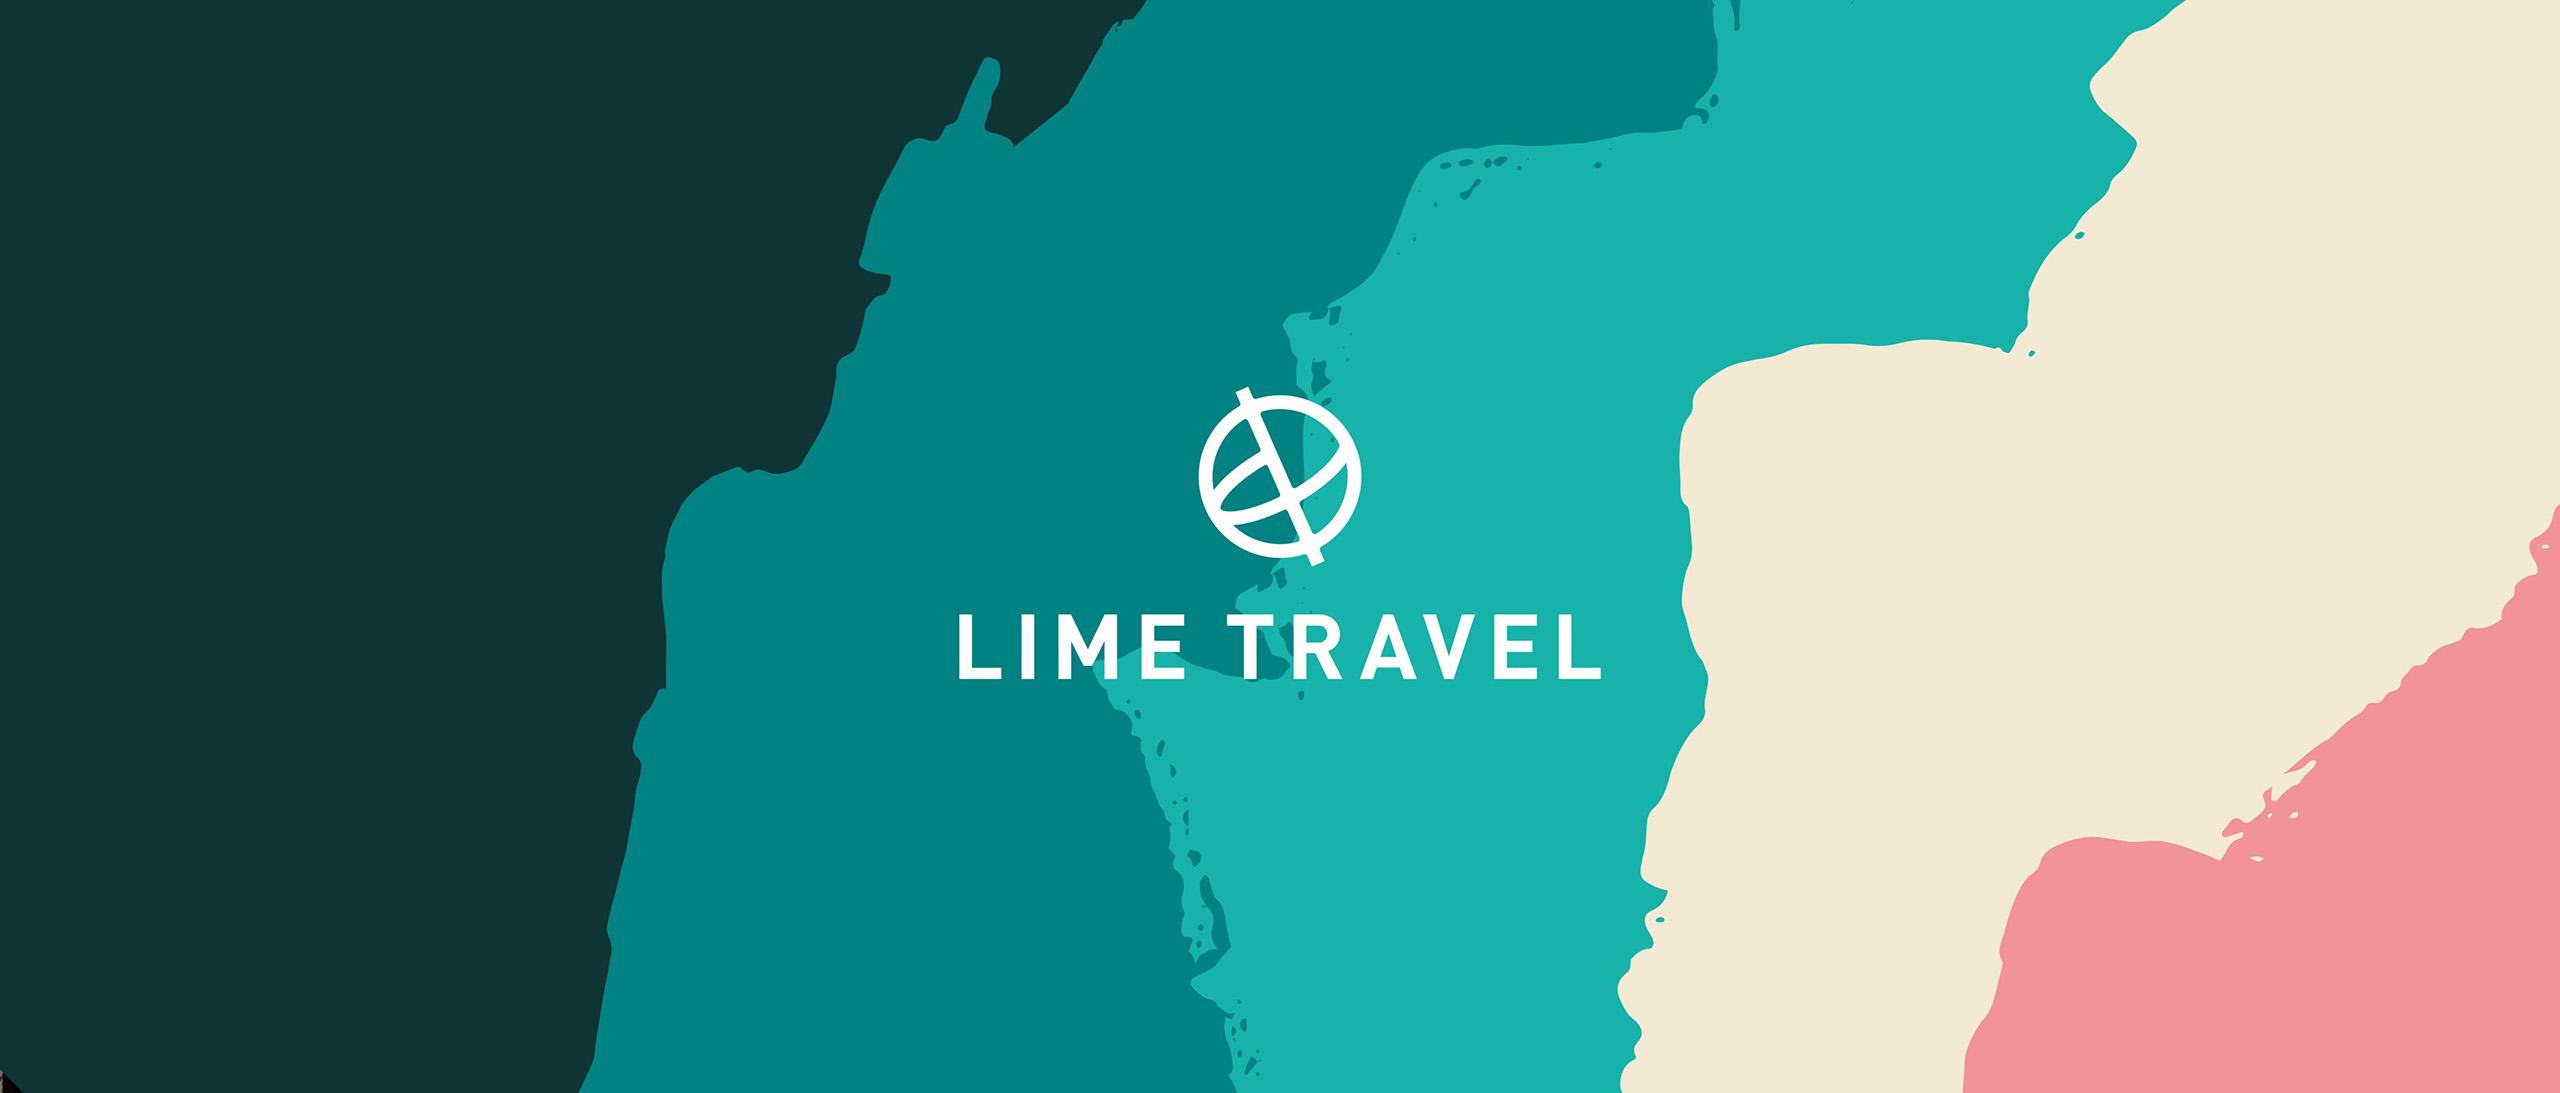 Lime Travel Identity